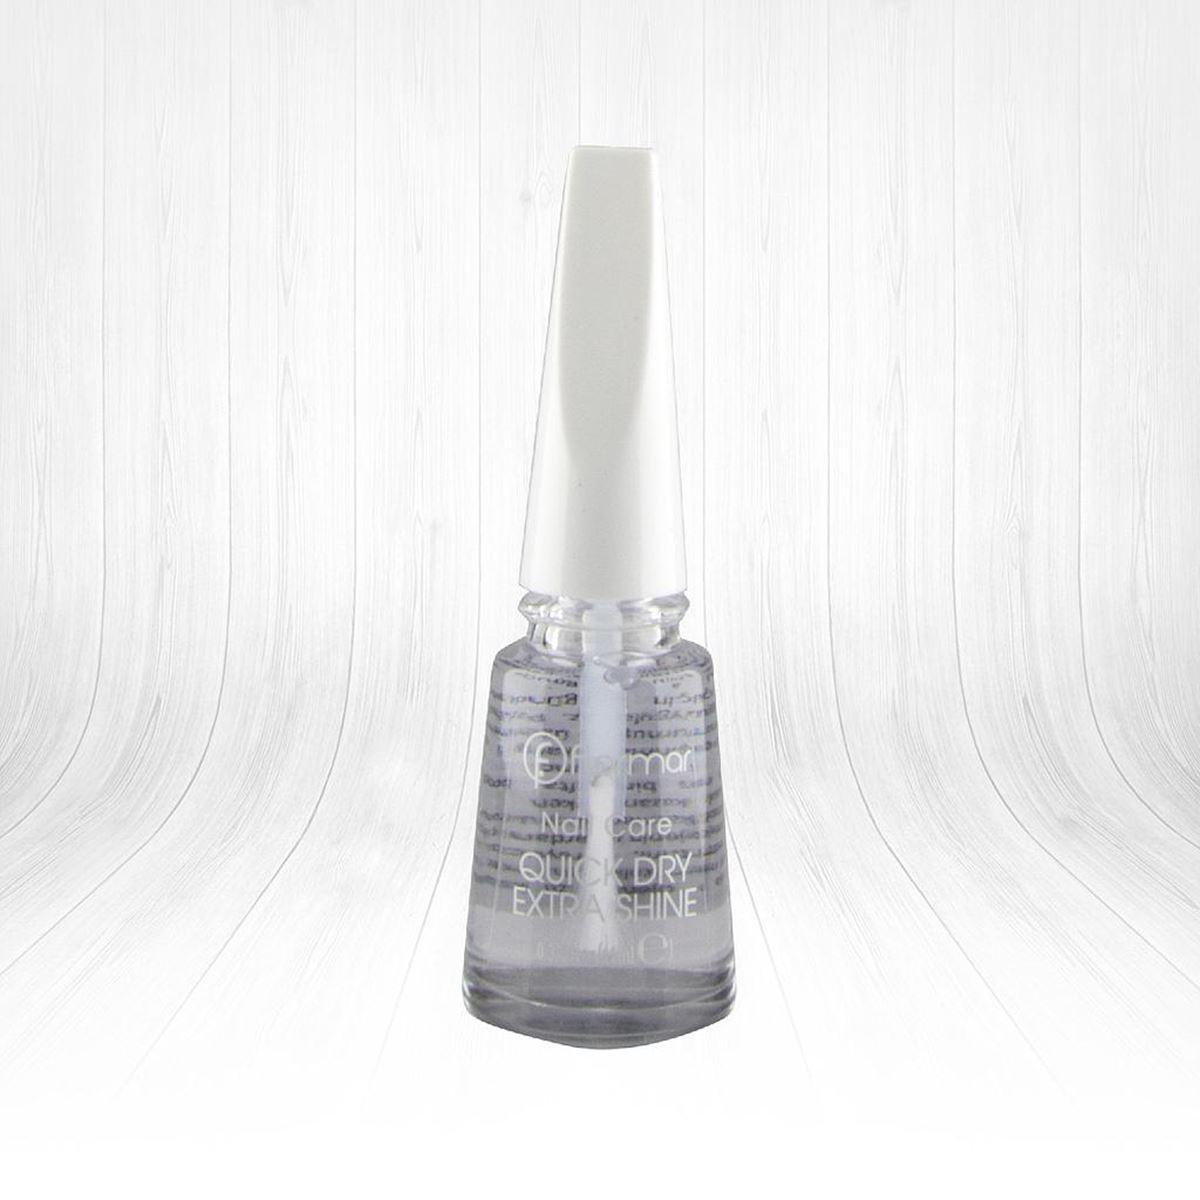 Flormar Quick Dry Extra Shine Ojeyi Çabuk Kurutan Cila 11ml